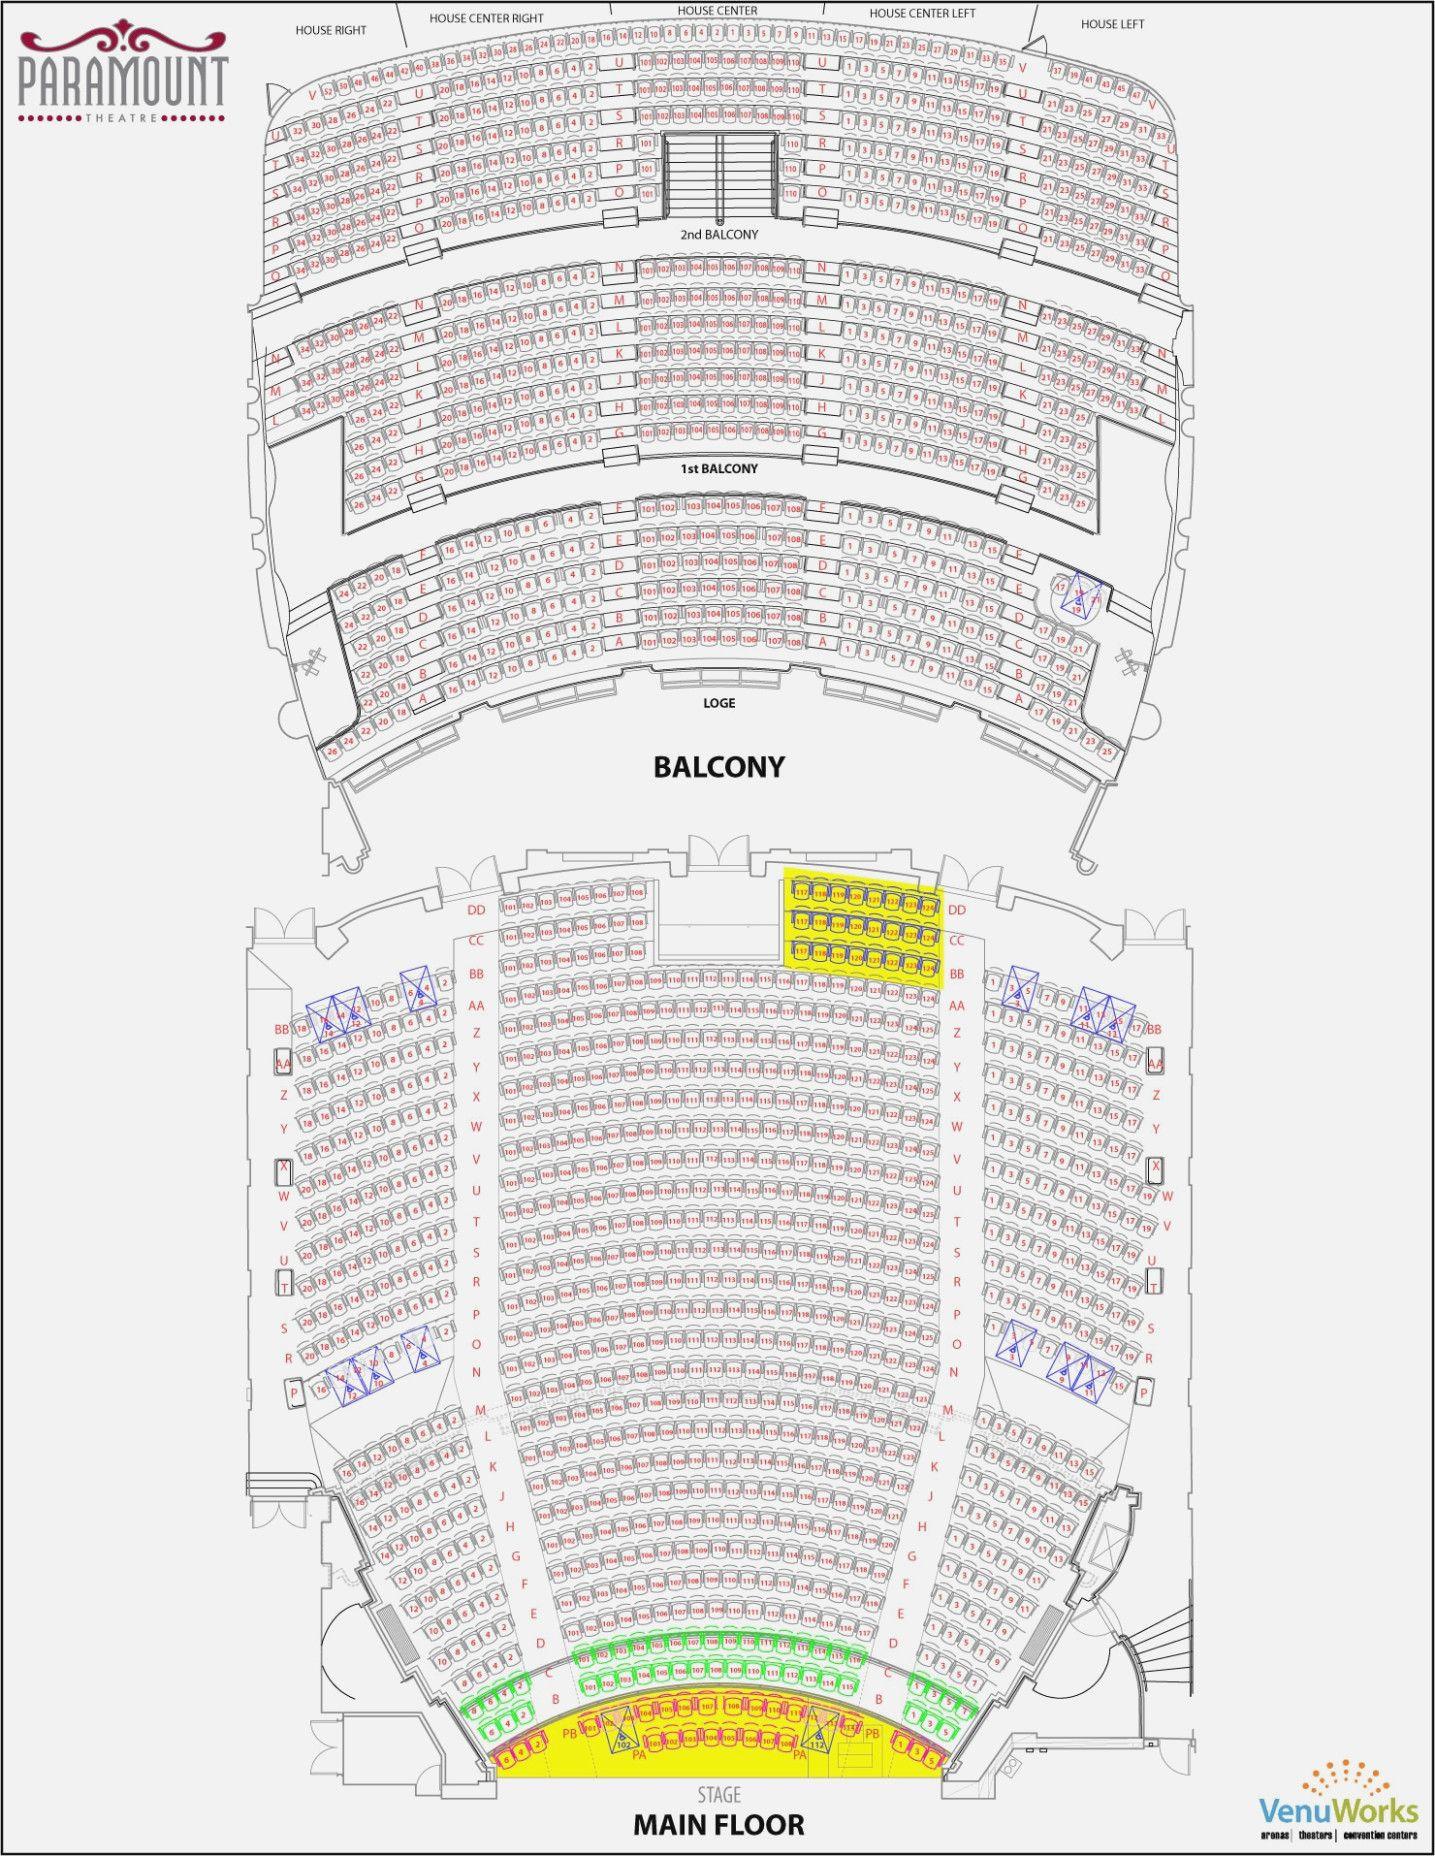 Orpheum Omaha Seating Chart Beautiful Orpheum Seating Chart Omaha Ne Seating Charts Oakdale Theater Seating